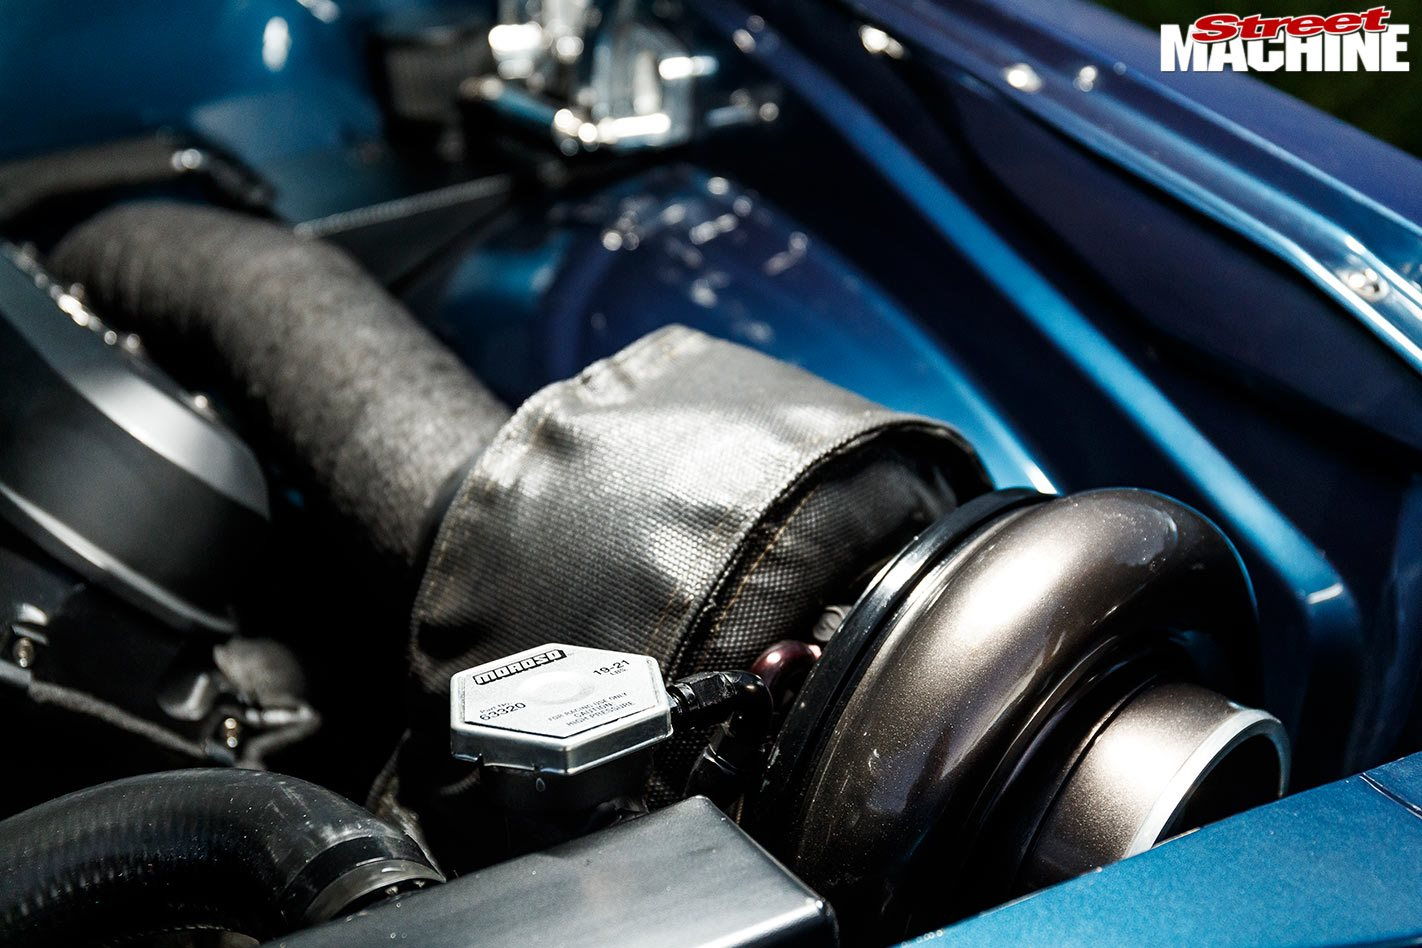 Turbo LS1-powered Holden LX Torana hatch